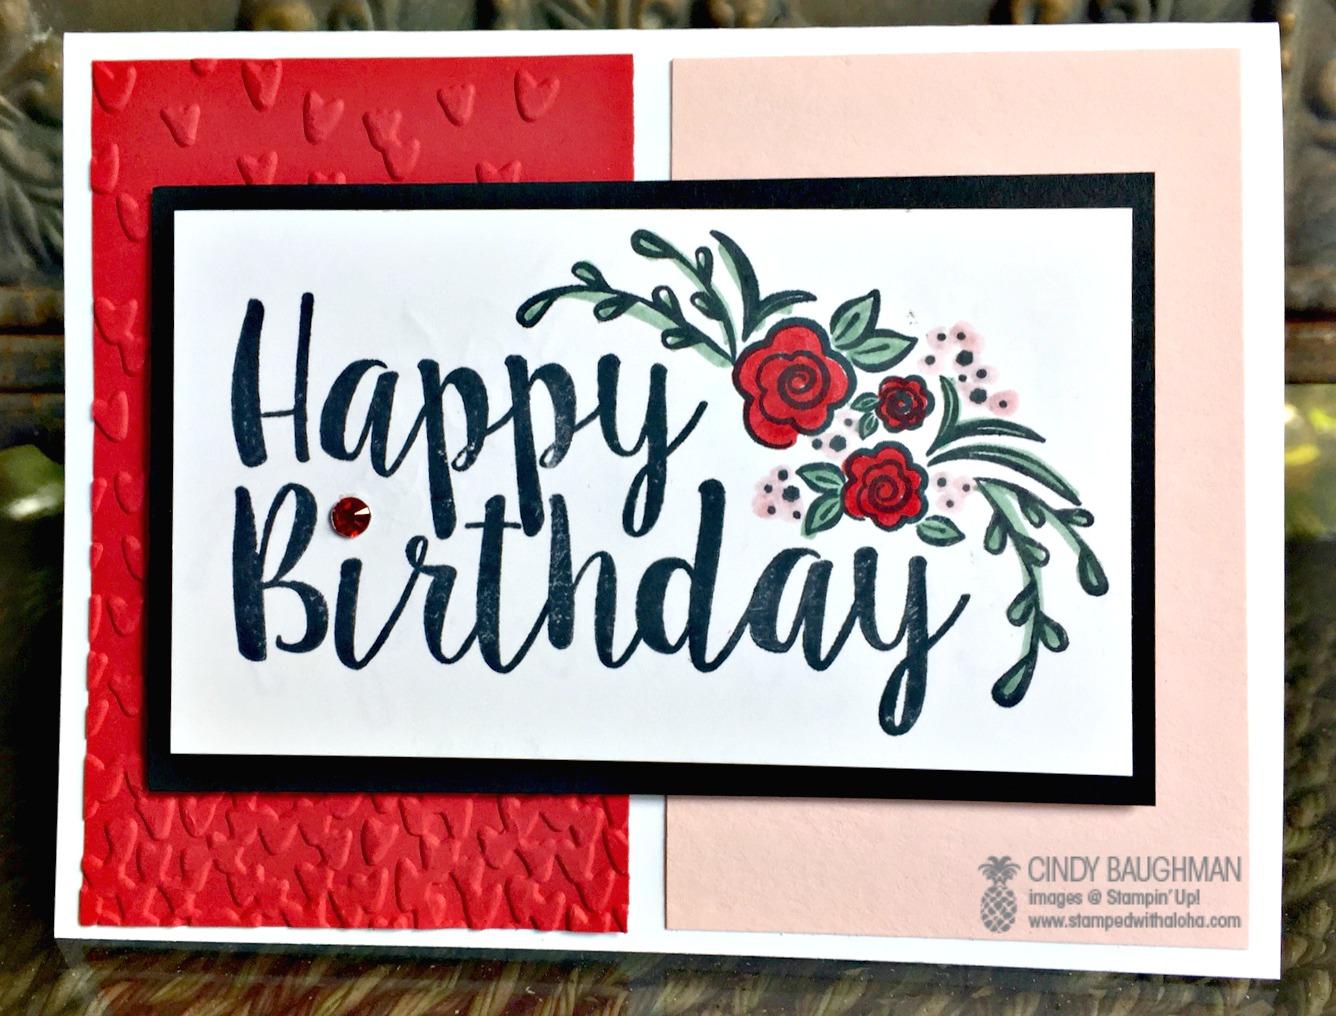 Big On Birthday's Card - www.stampedwithaloha.com